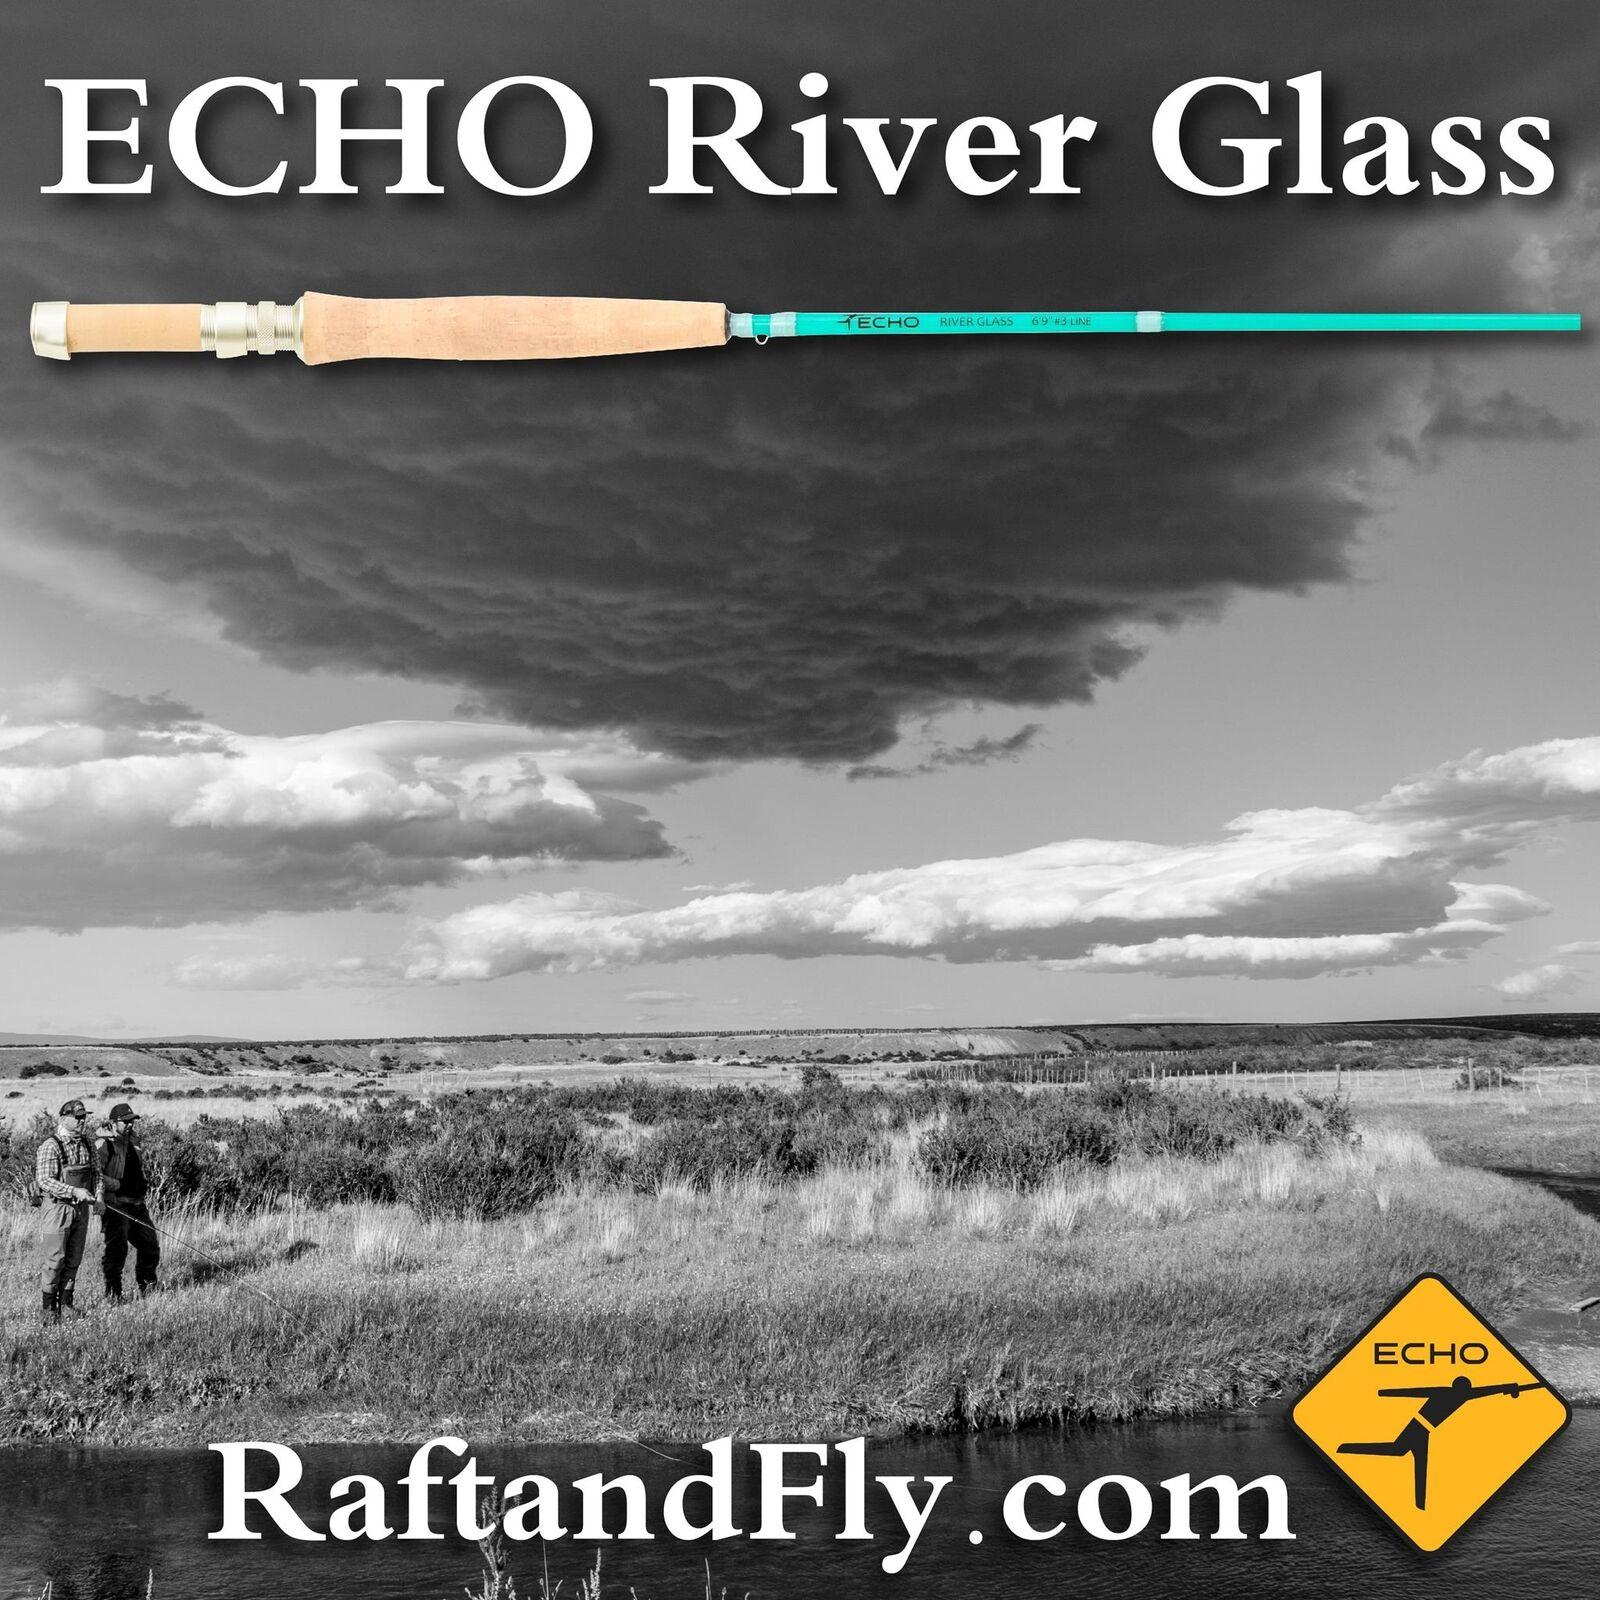 Echo Río Vidrio 4wt Glaciar Azul 7' 6  - Garantía De Por Vida-Envío Gratis